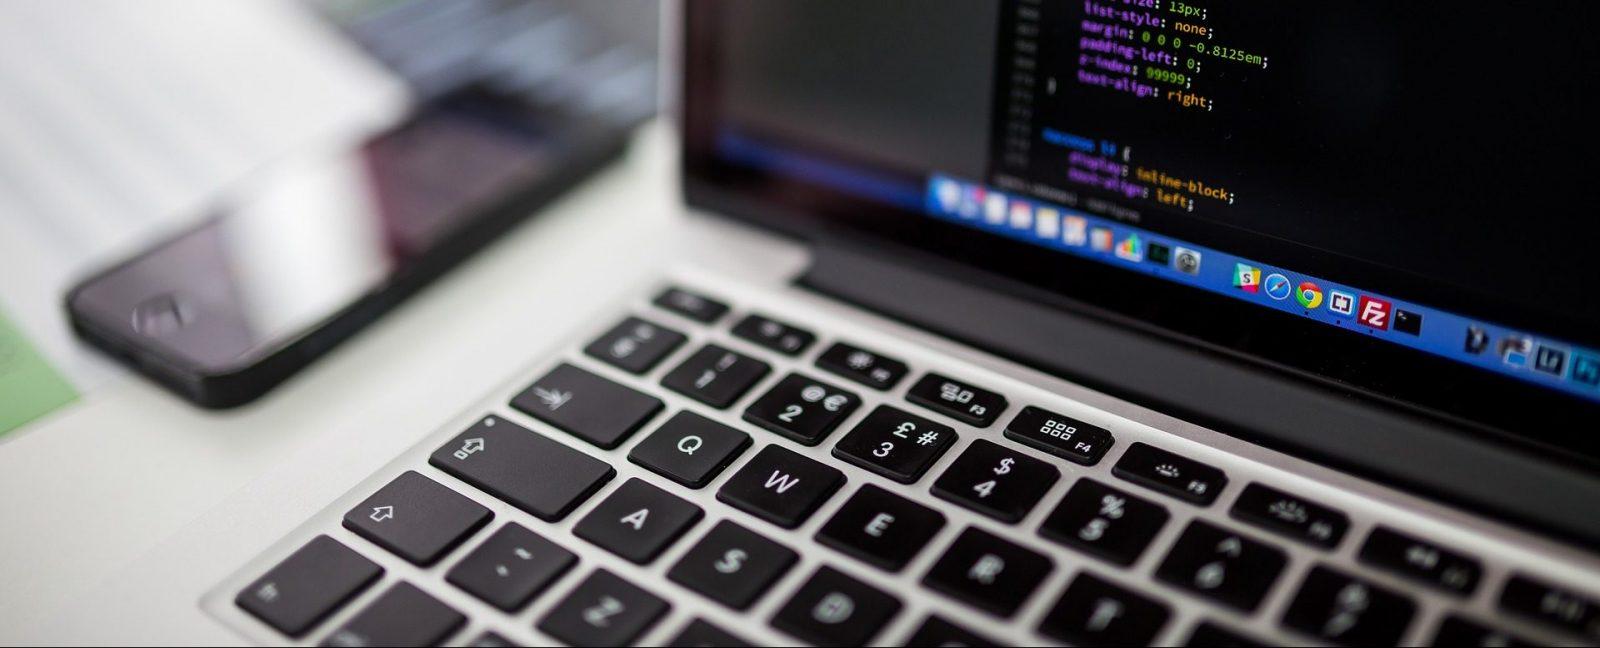 Клавиатура, ноутбук